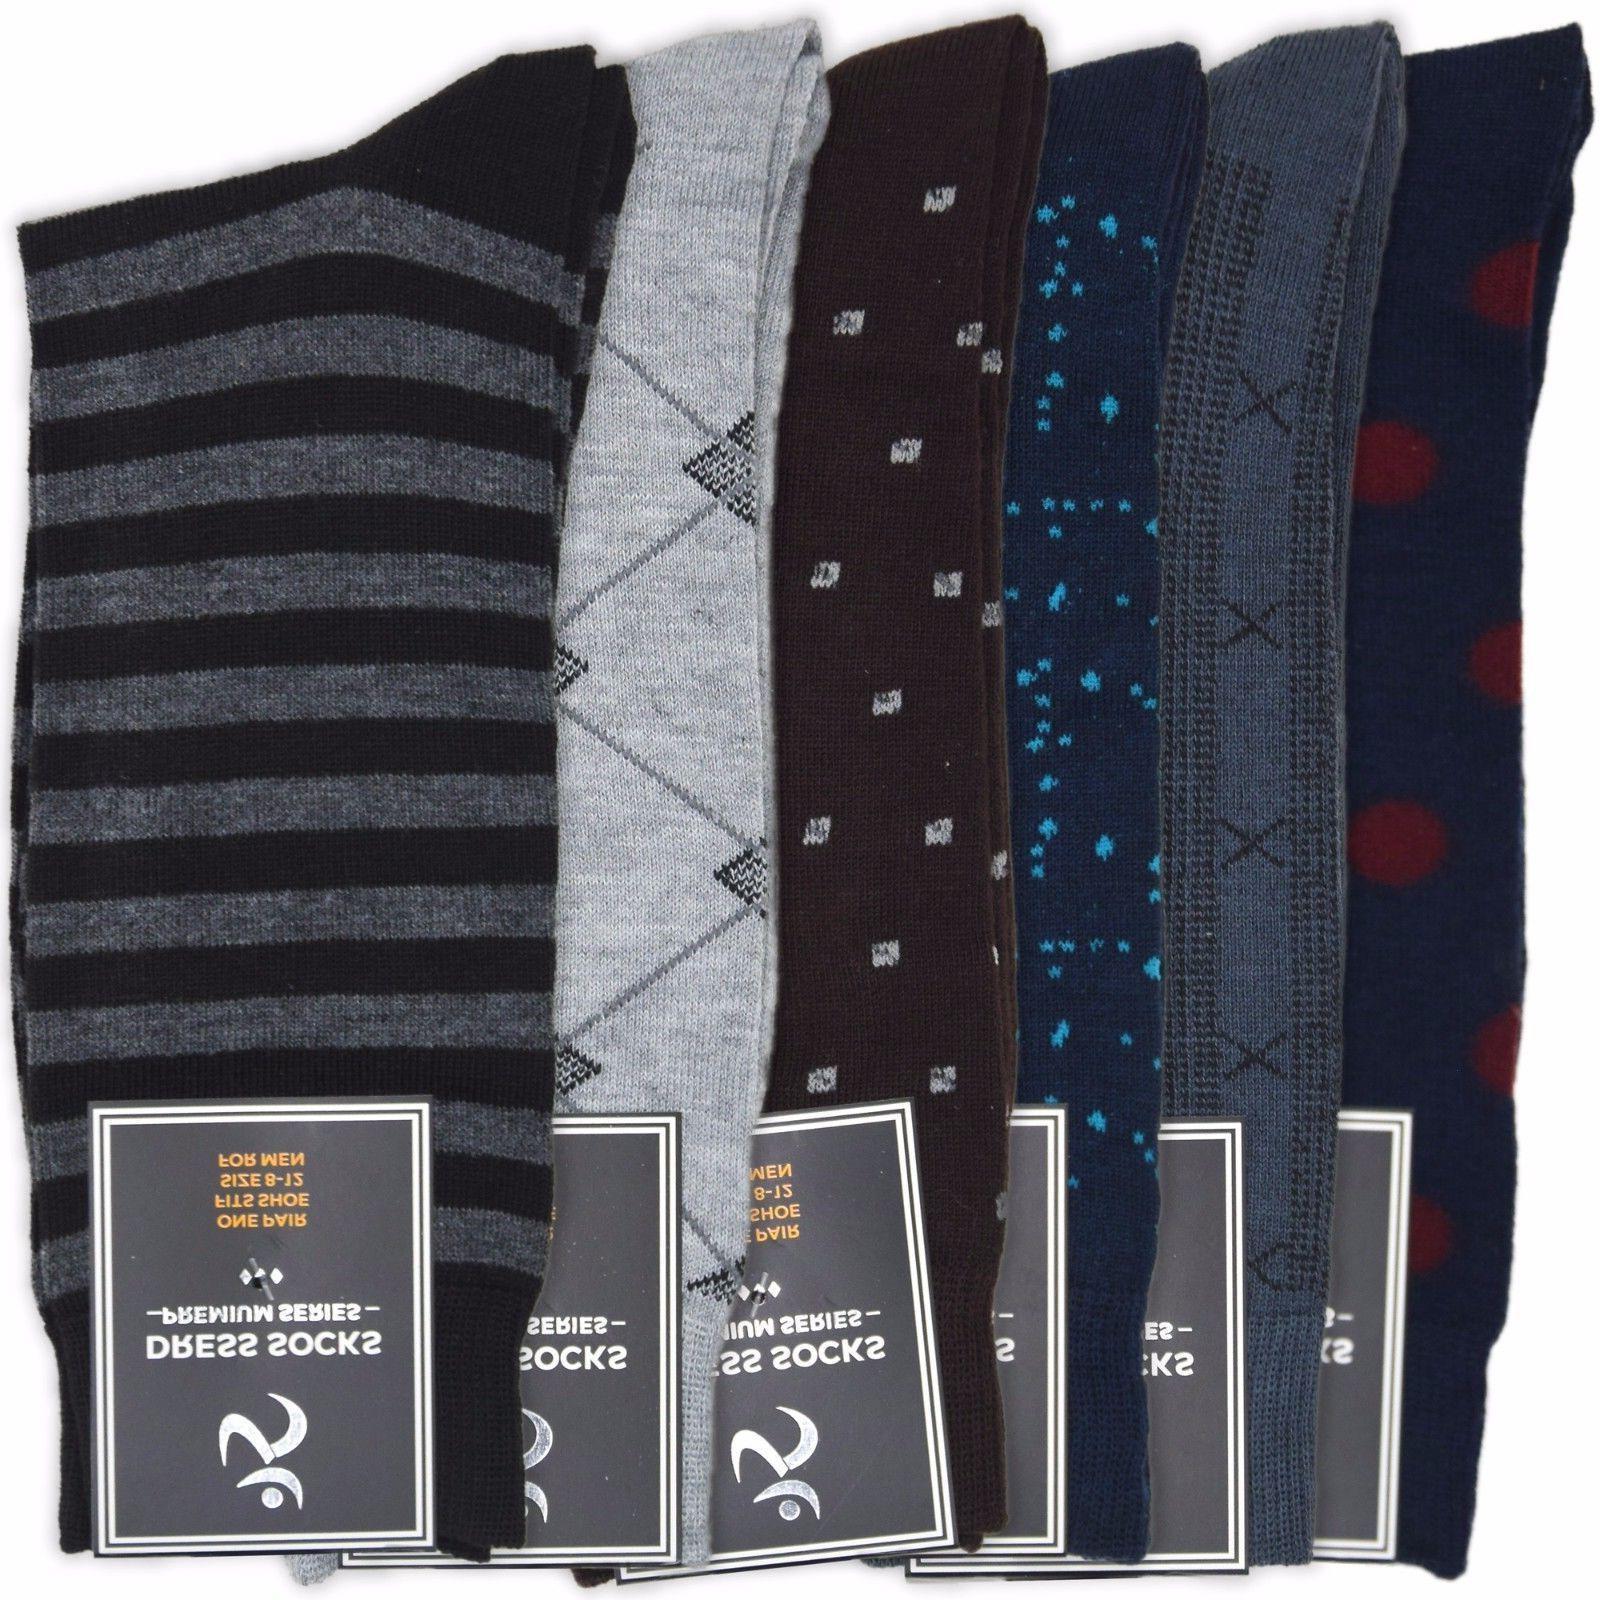 Men's Dress Socks 6-Pack | Mens Mid Calf Solid Black Gray Br